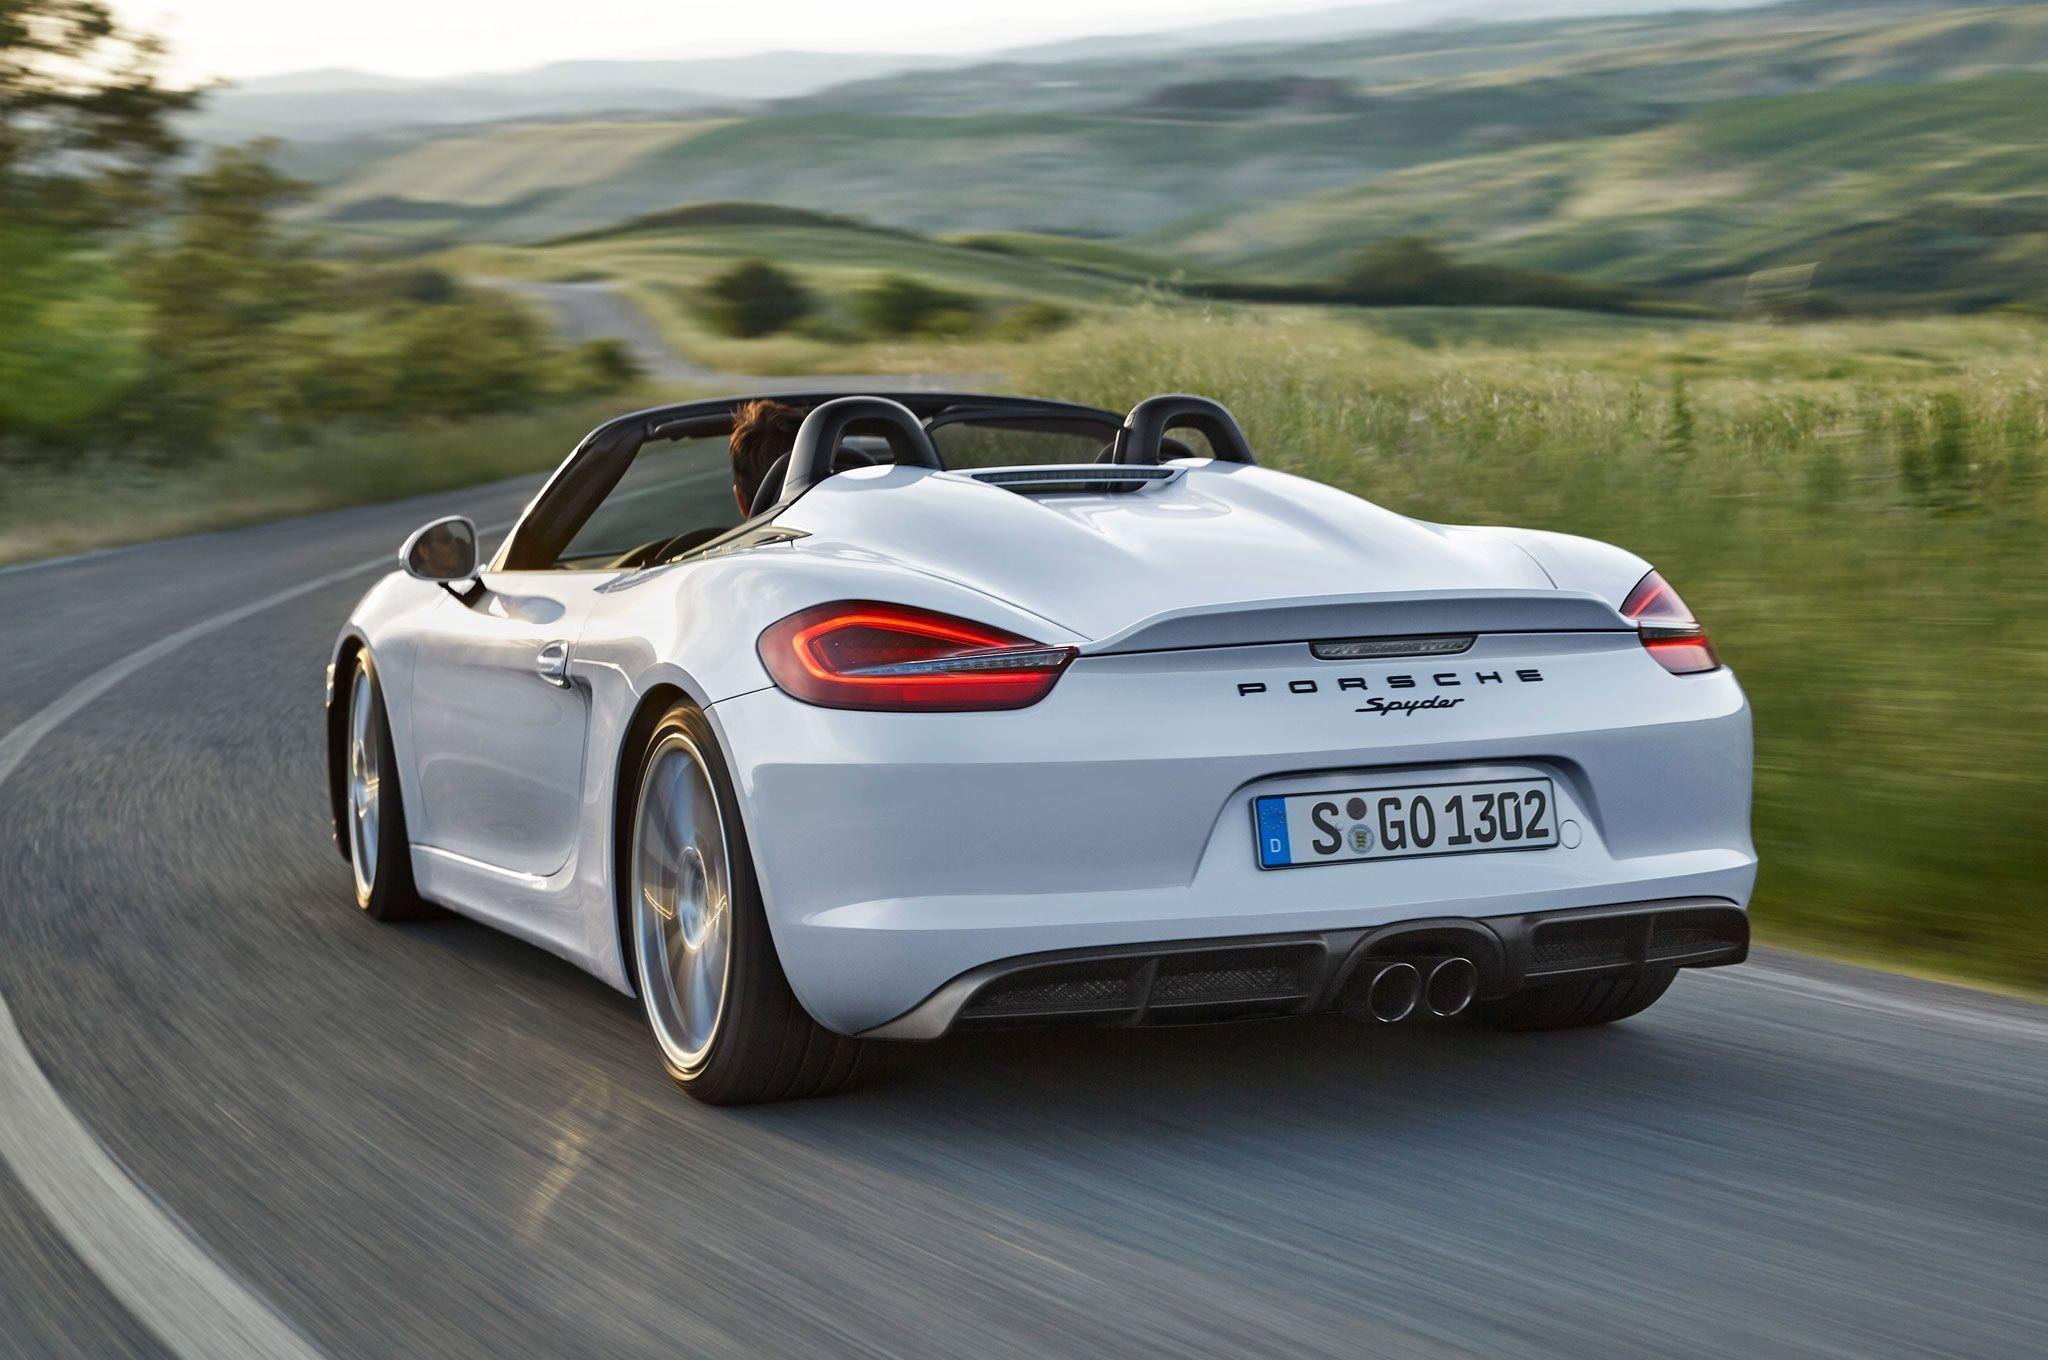 2019 Porsche 718 Boxster Spyder Spied Testing a Flat-Six Engine